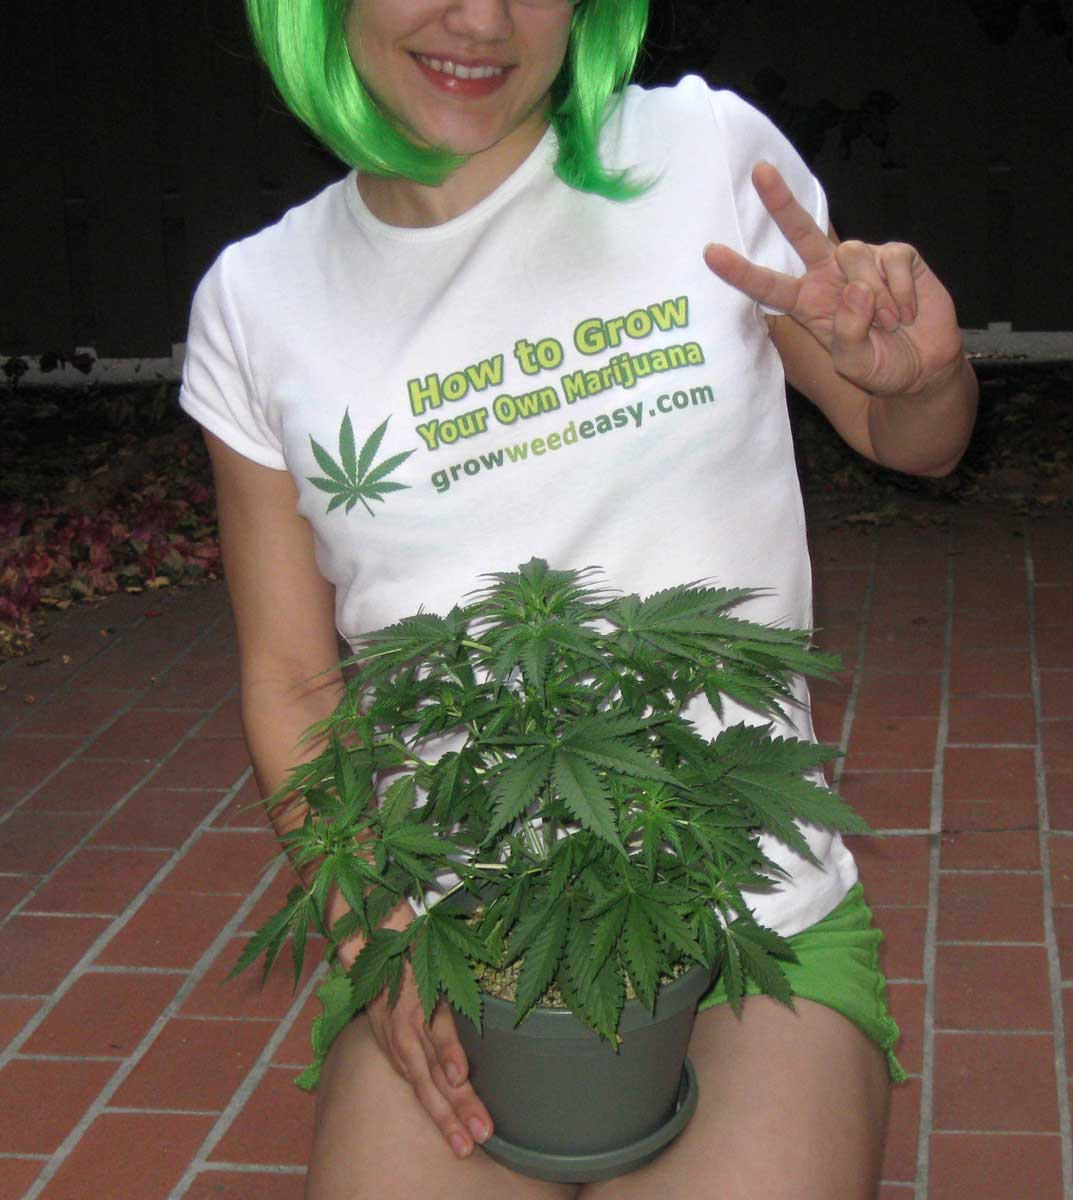 How Do I Transplant Marijuana for Faster Growth? | Grow Weed Easy